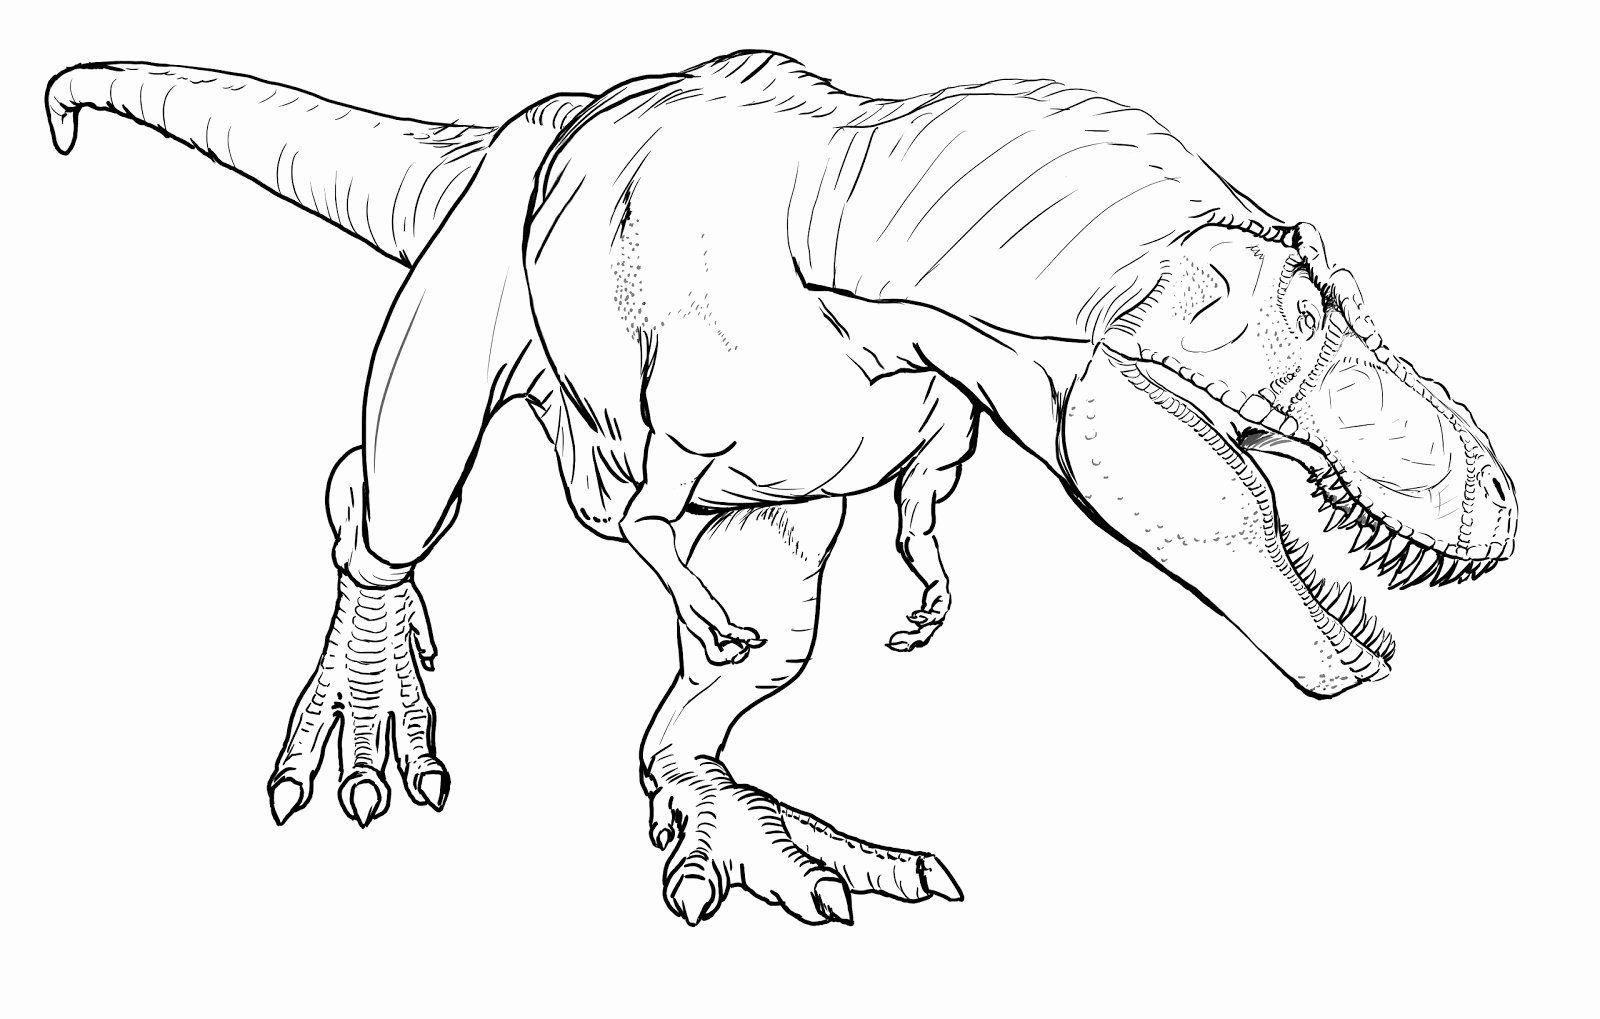 T Rex Printable Coloring Pages Elegant Trex Coloring Pages Best Coloring Pages For Kids In 2020 Dinosaur Coloring Pages Dinosaur Coloring Animal Coloring Pages